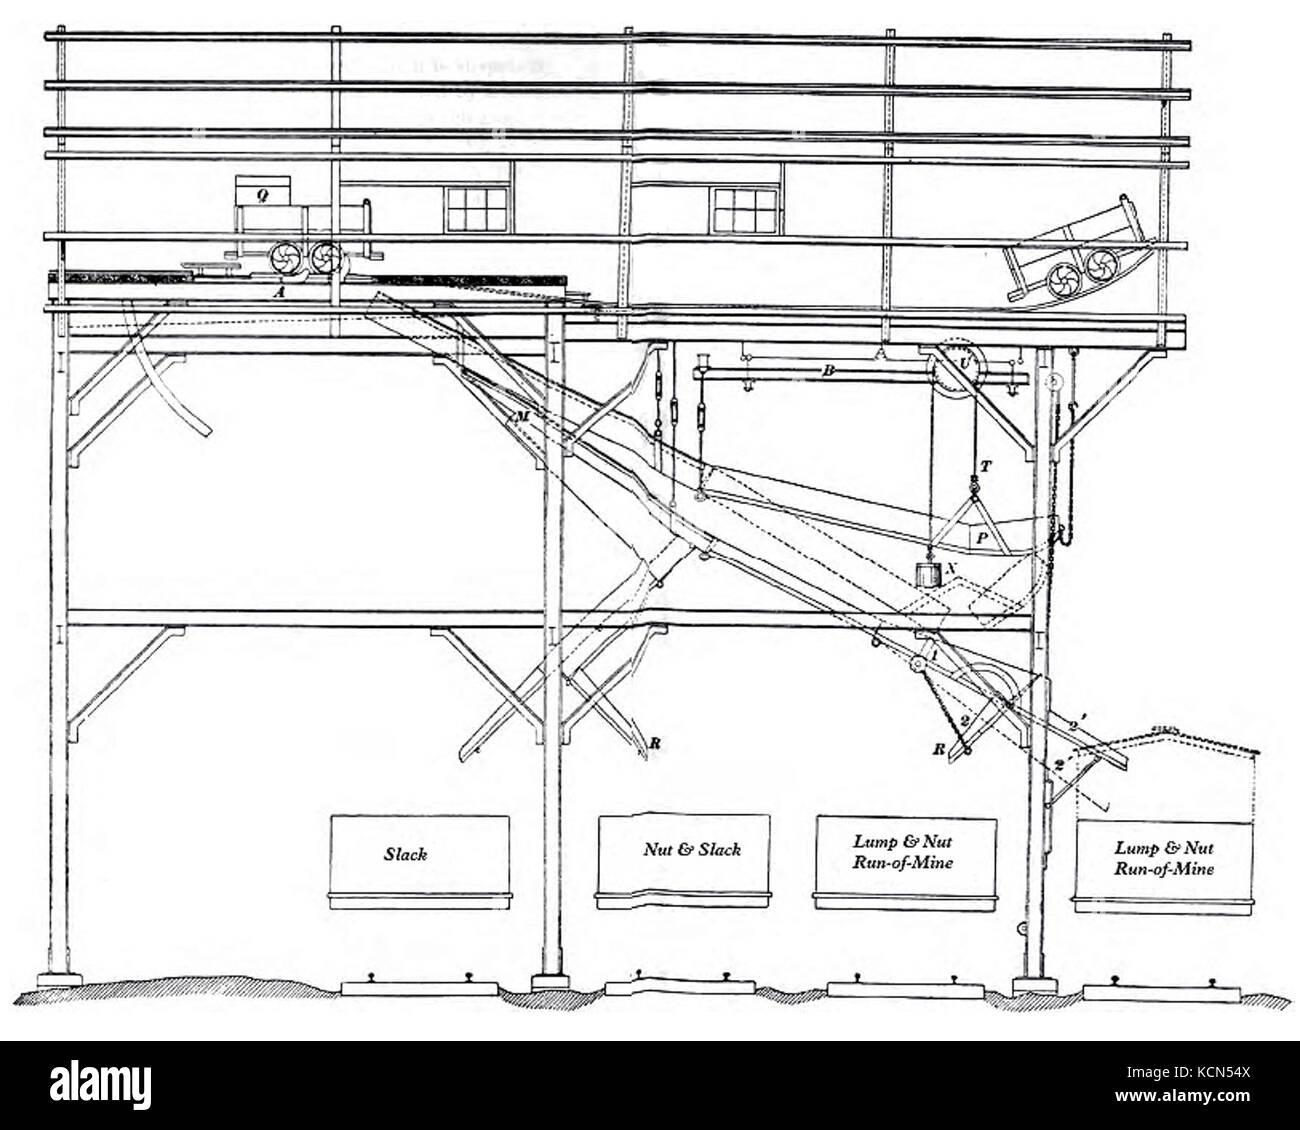 hight resolution of coal tipple diagram 1900